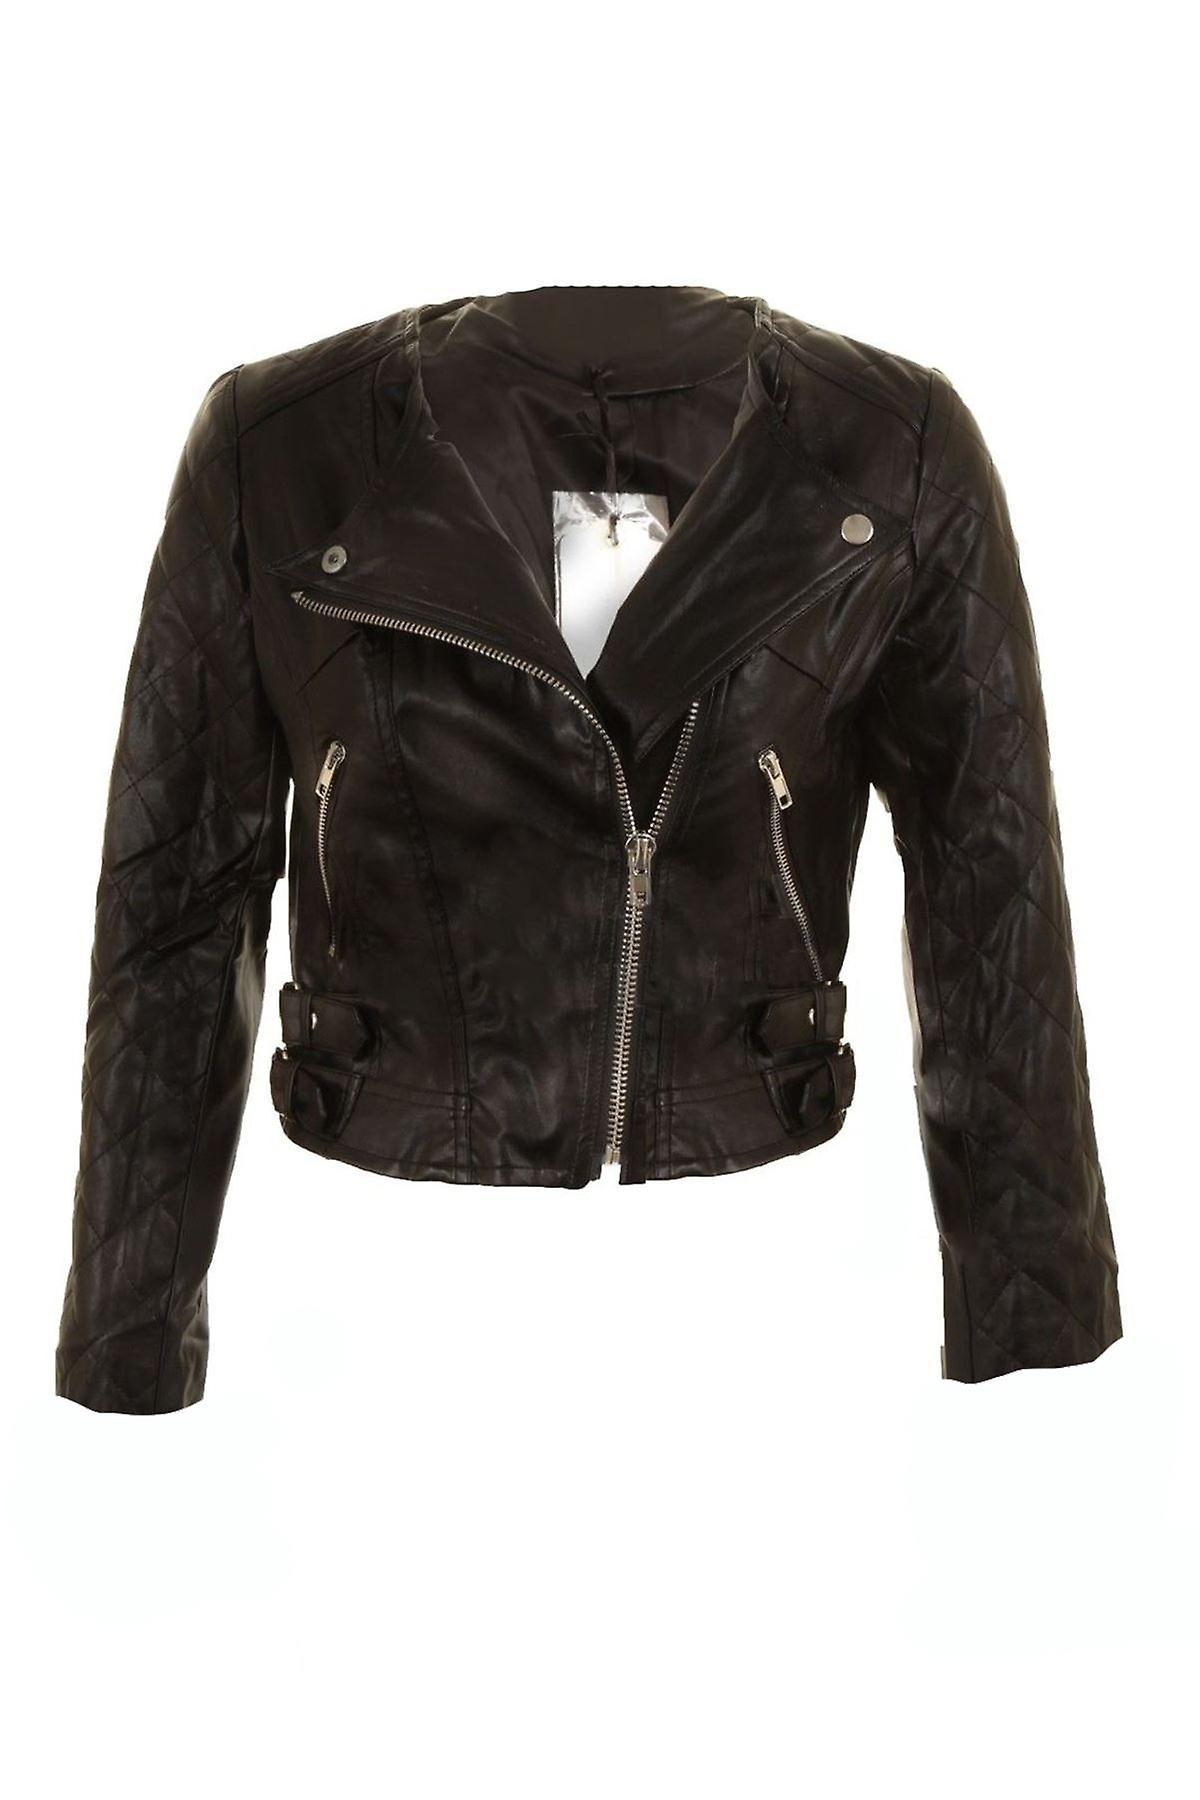 Ladies Black Biker Jacket Silver Zip PVC Leather Long Sleeve Women's Coat